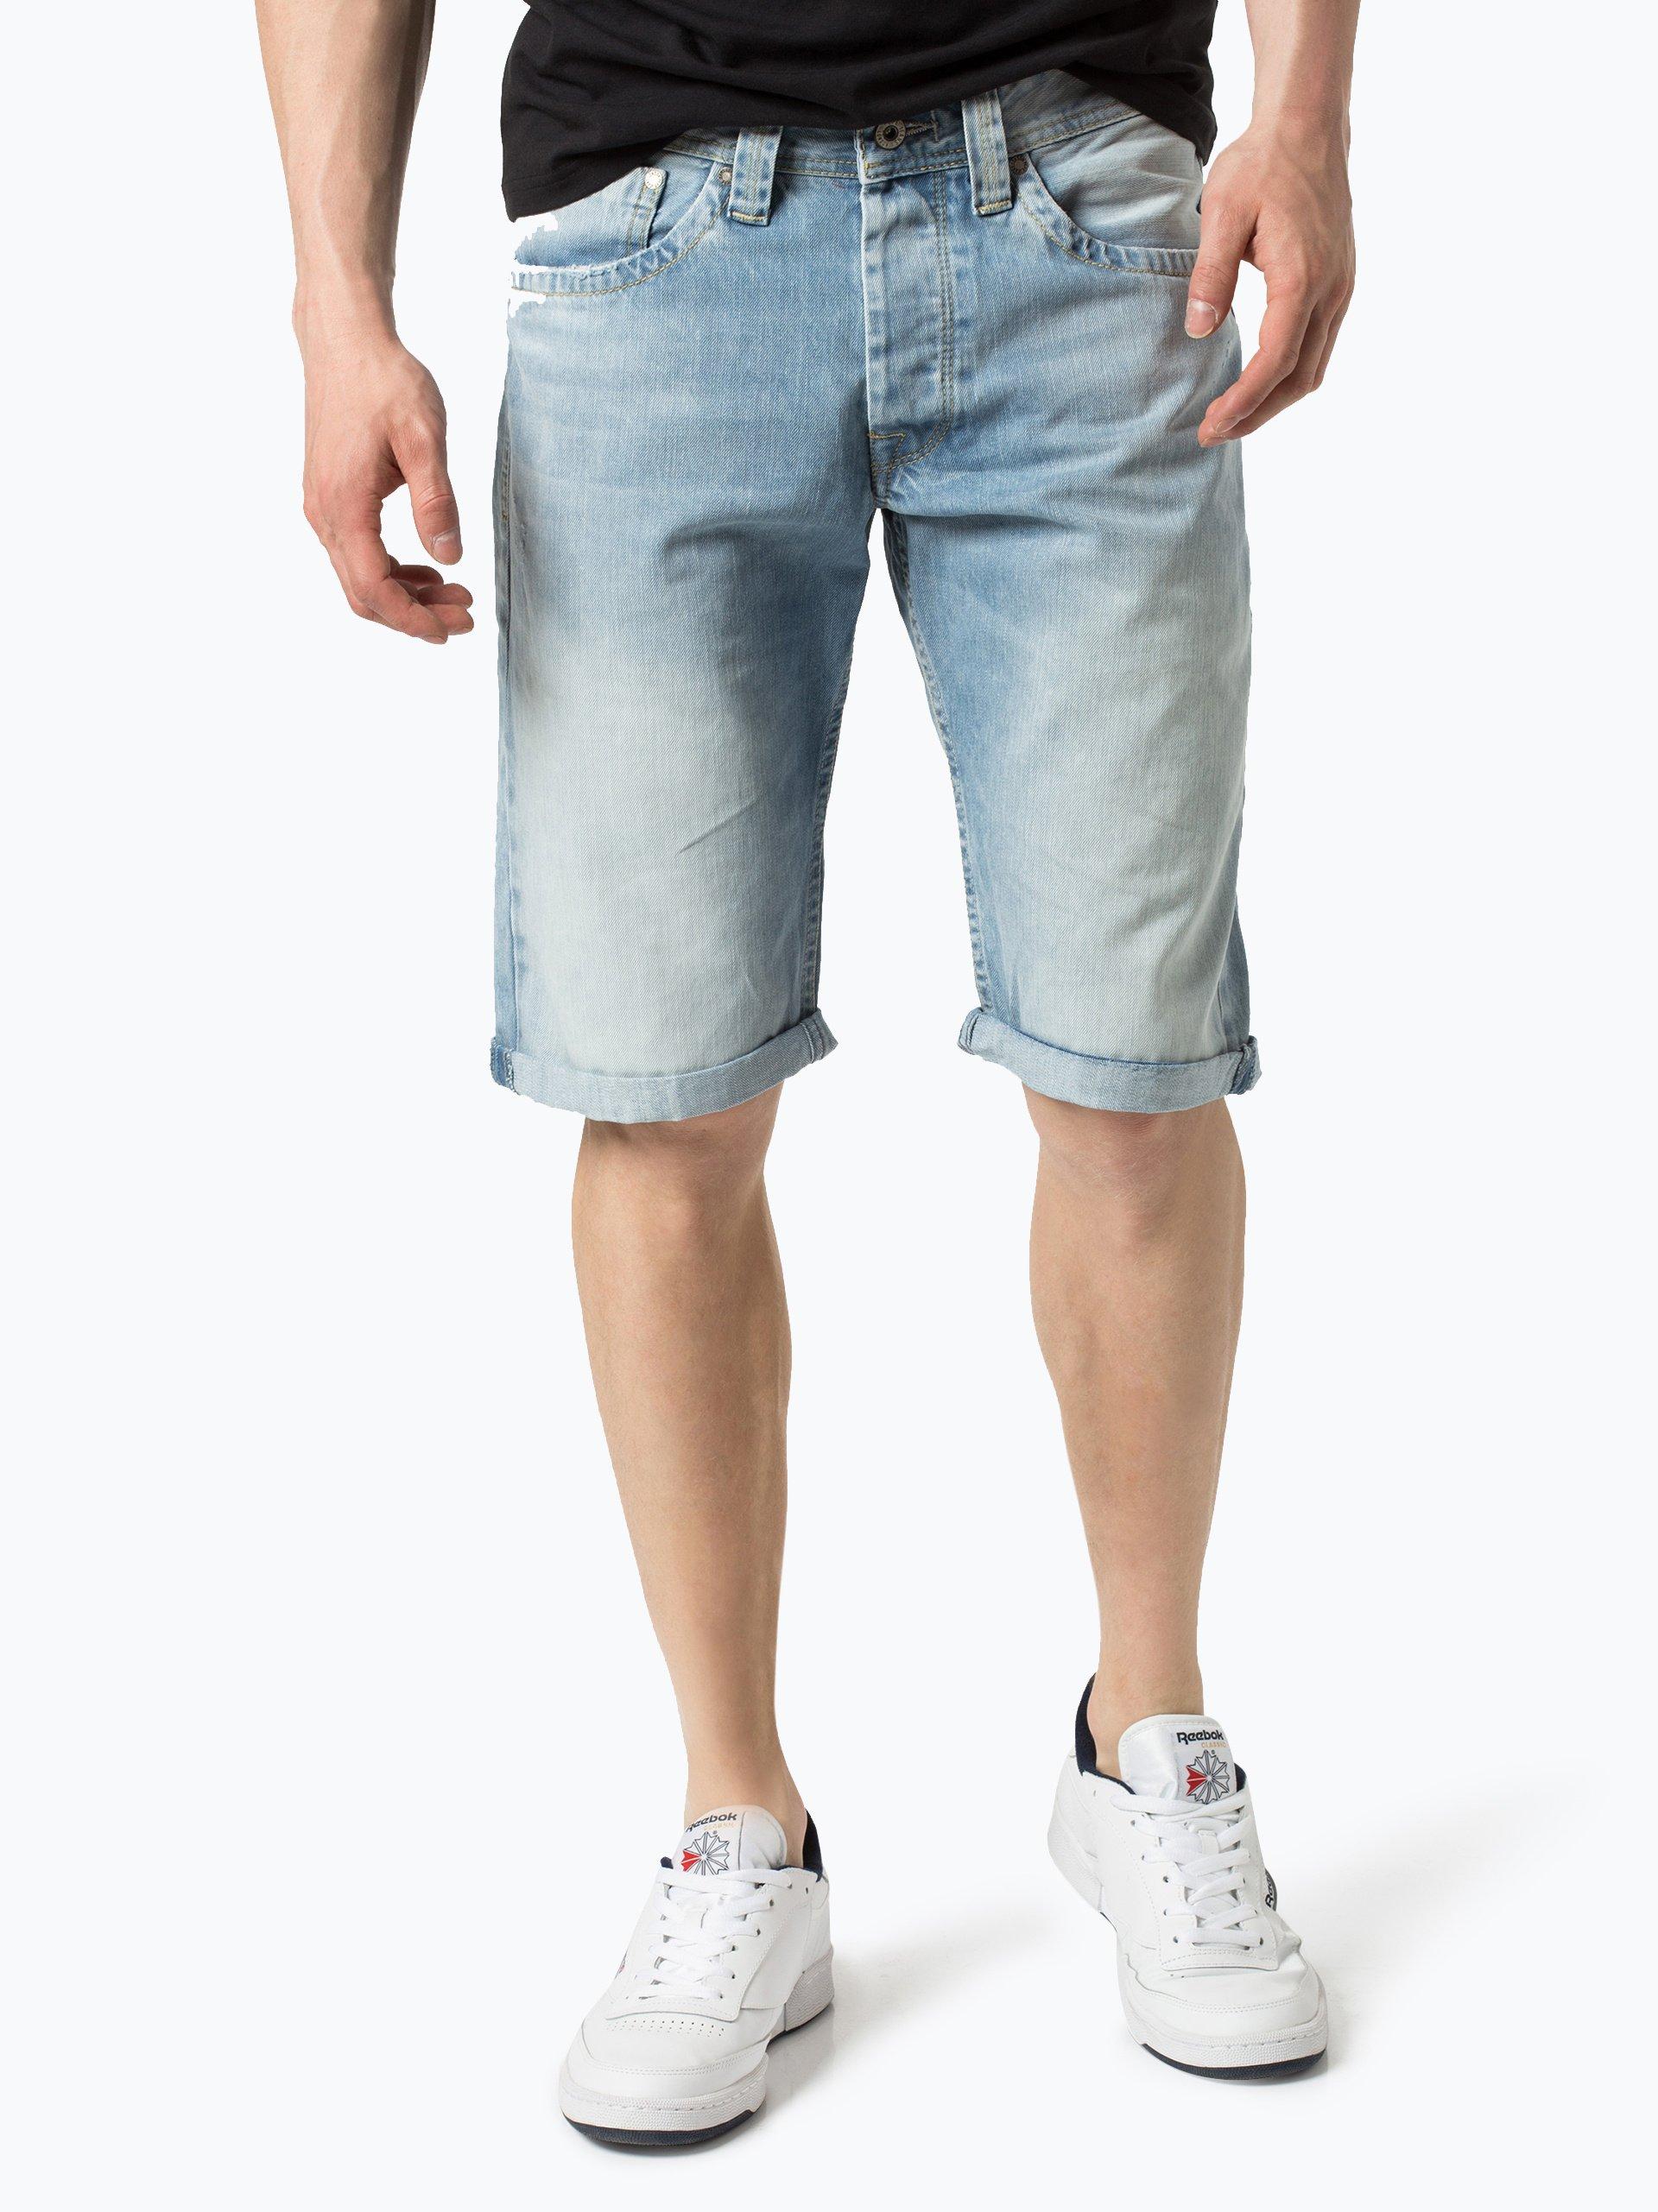 pepe jeans herren jeansshorts cash 2 online kaufen peek und cloppenburg de. Black Bedroom Furniture Sets. Home Design Ideas